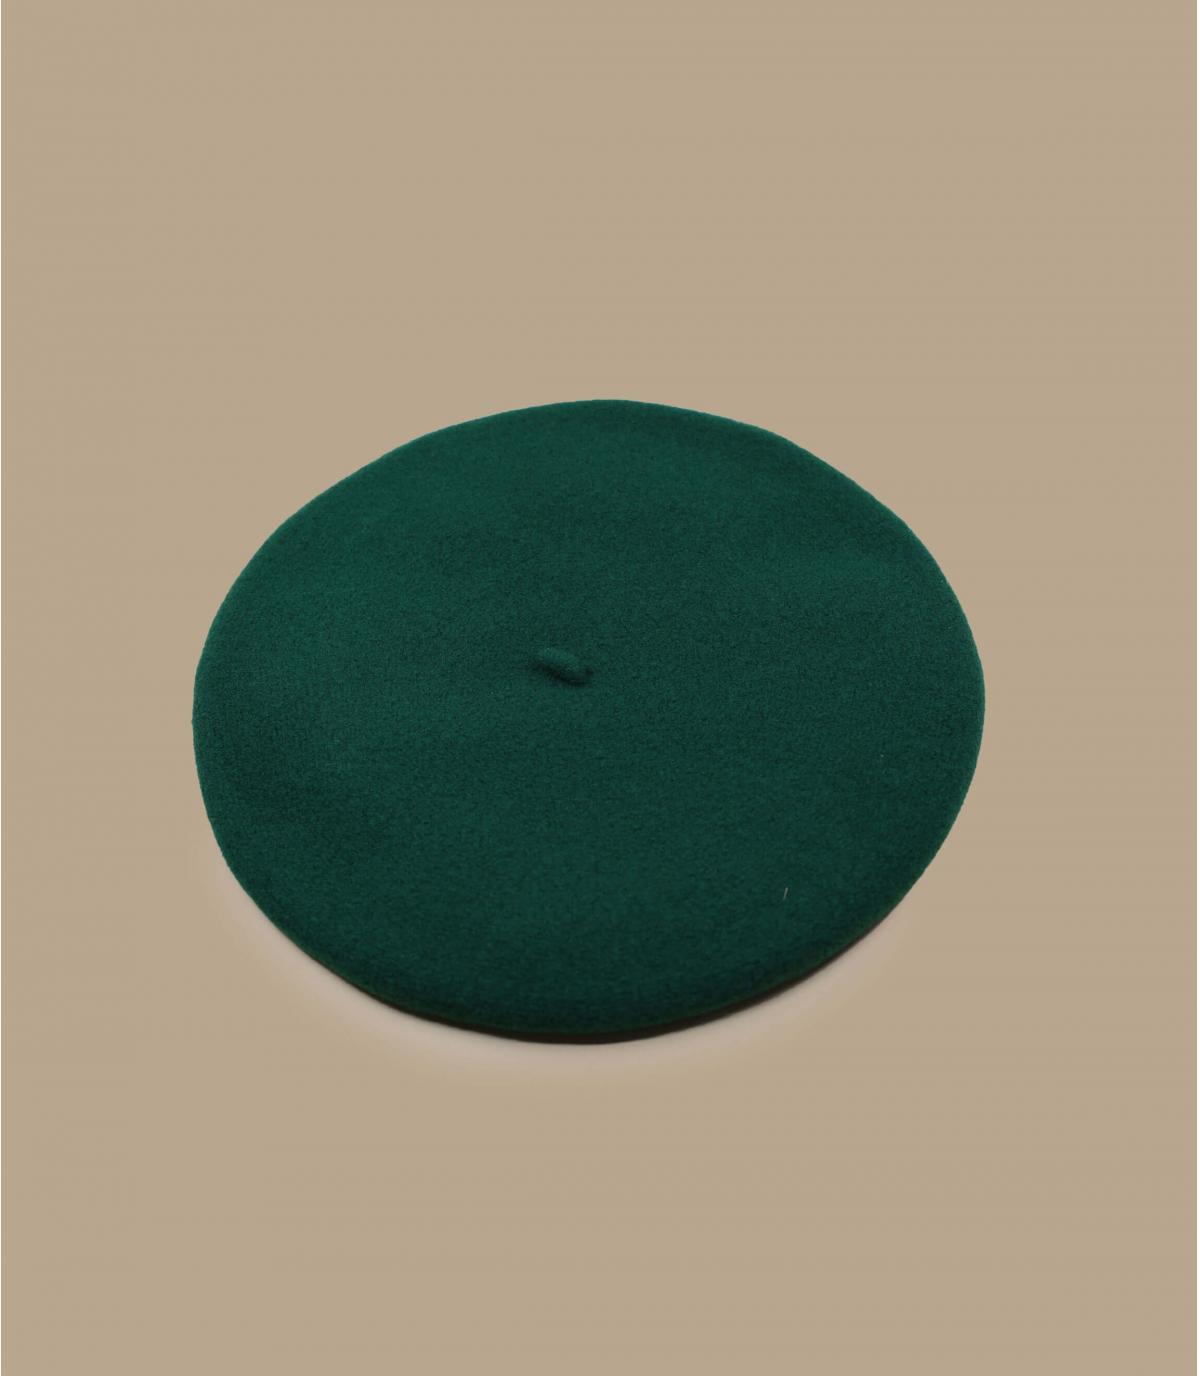 Green beret Laulhère merino